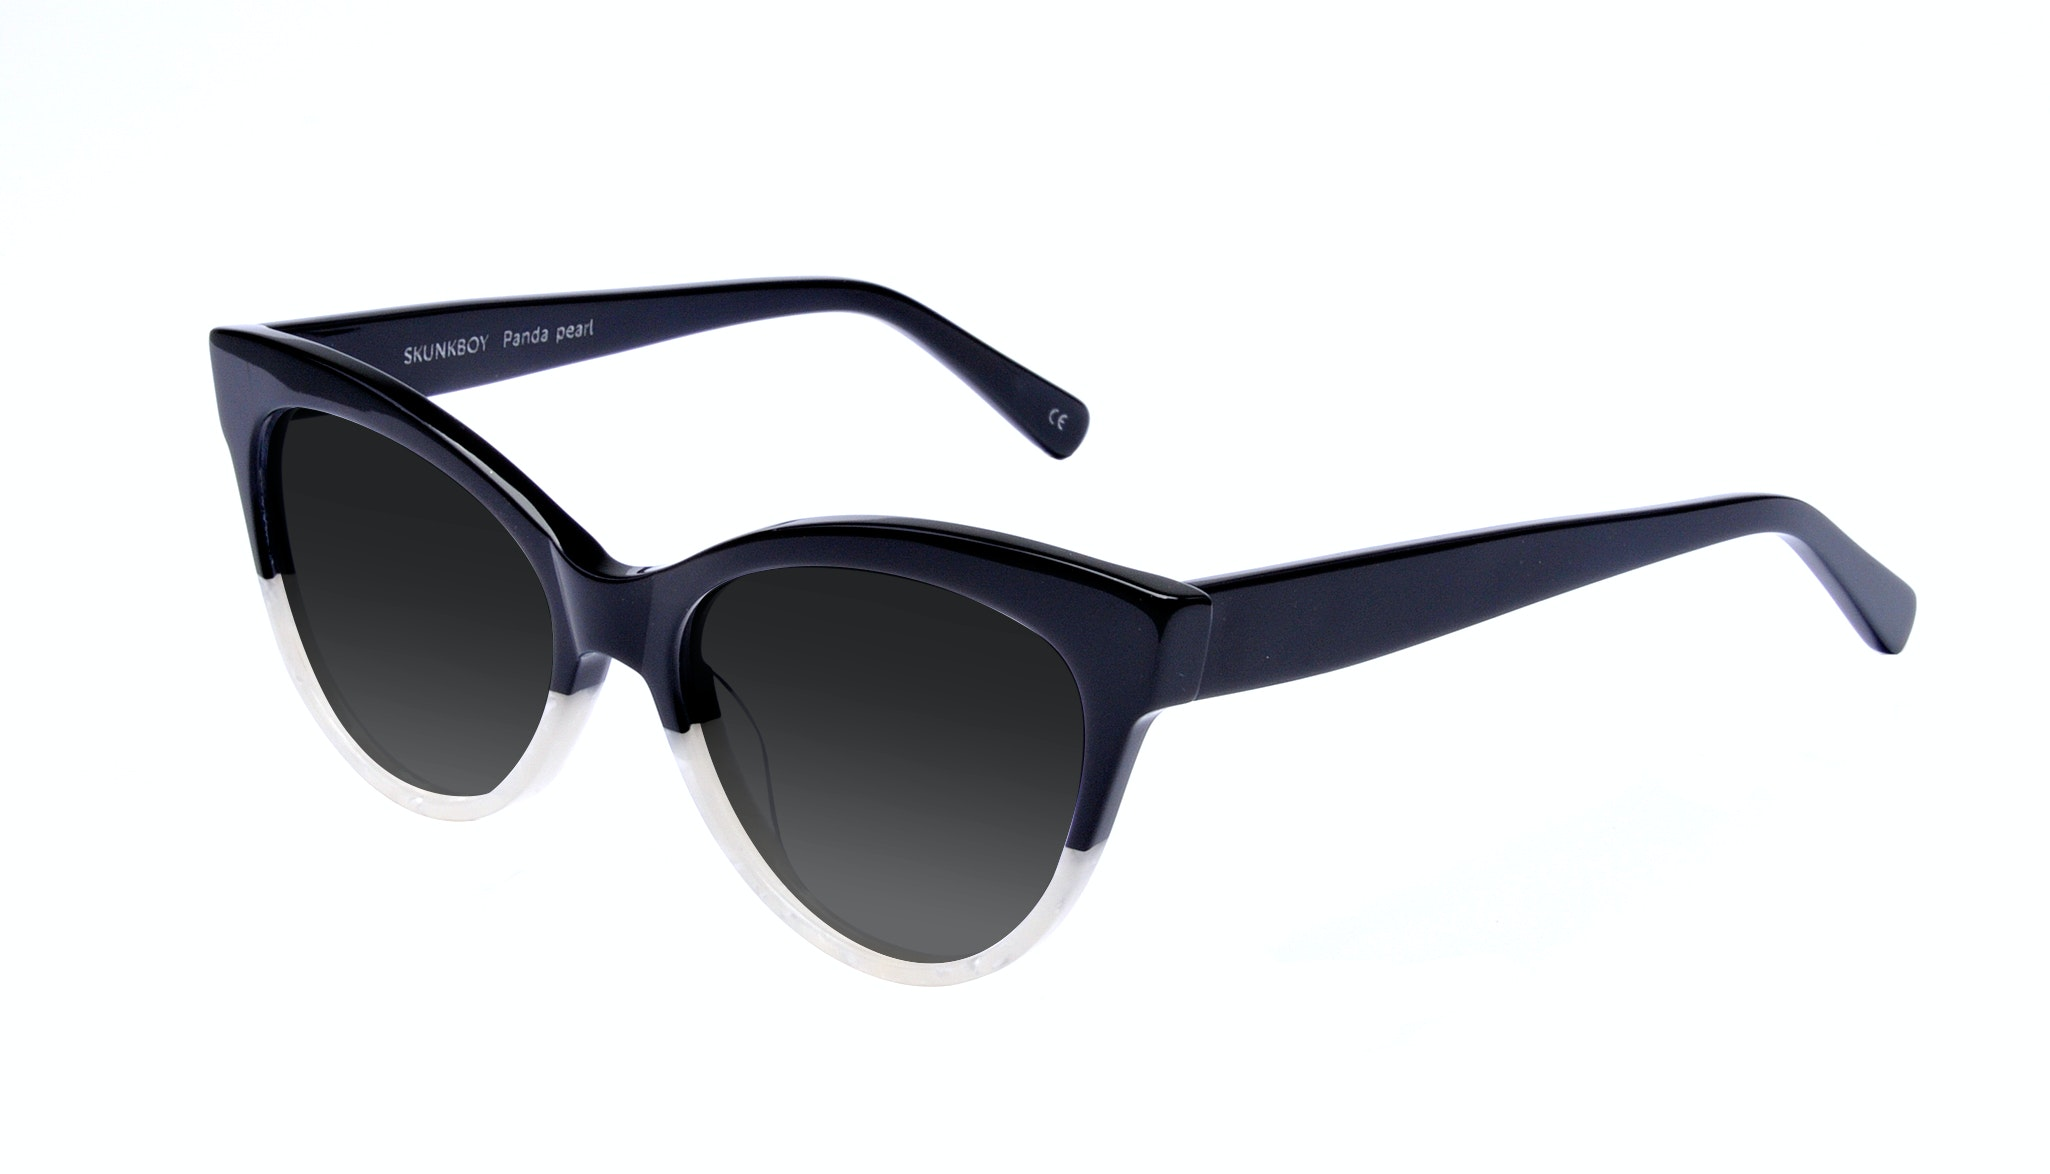 Affordable Fashion Glasses Cat Eye Square Sunglasses Women SkunkBoy Panda Pearl Tilt